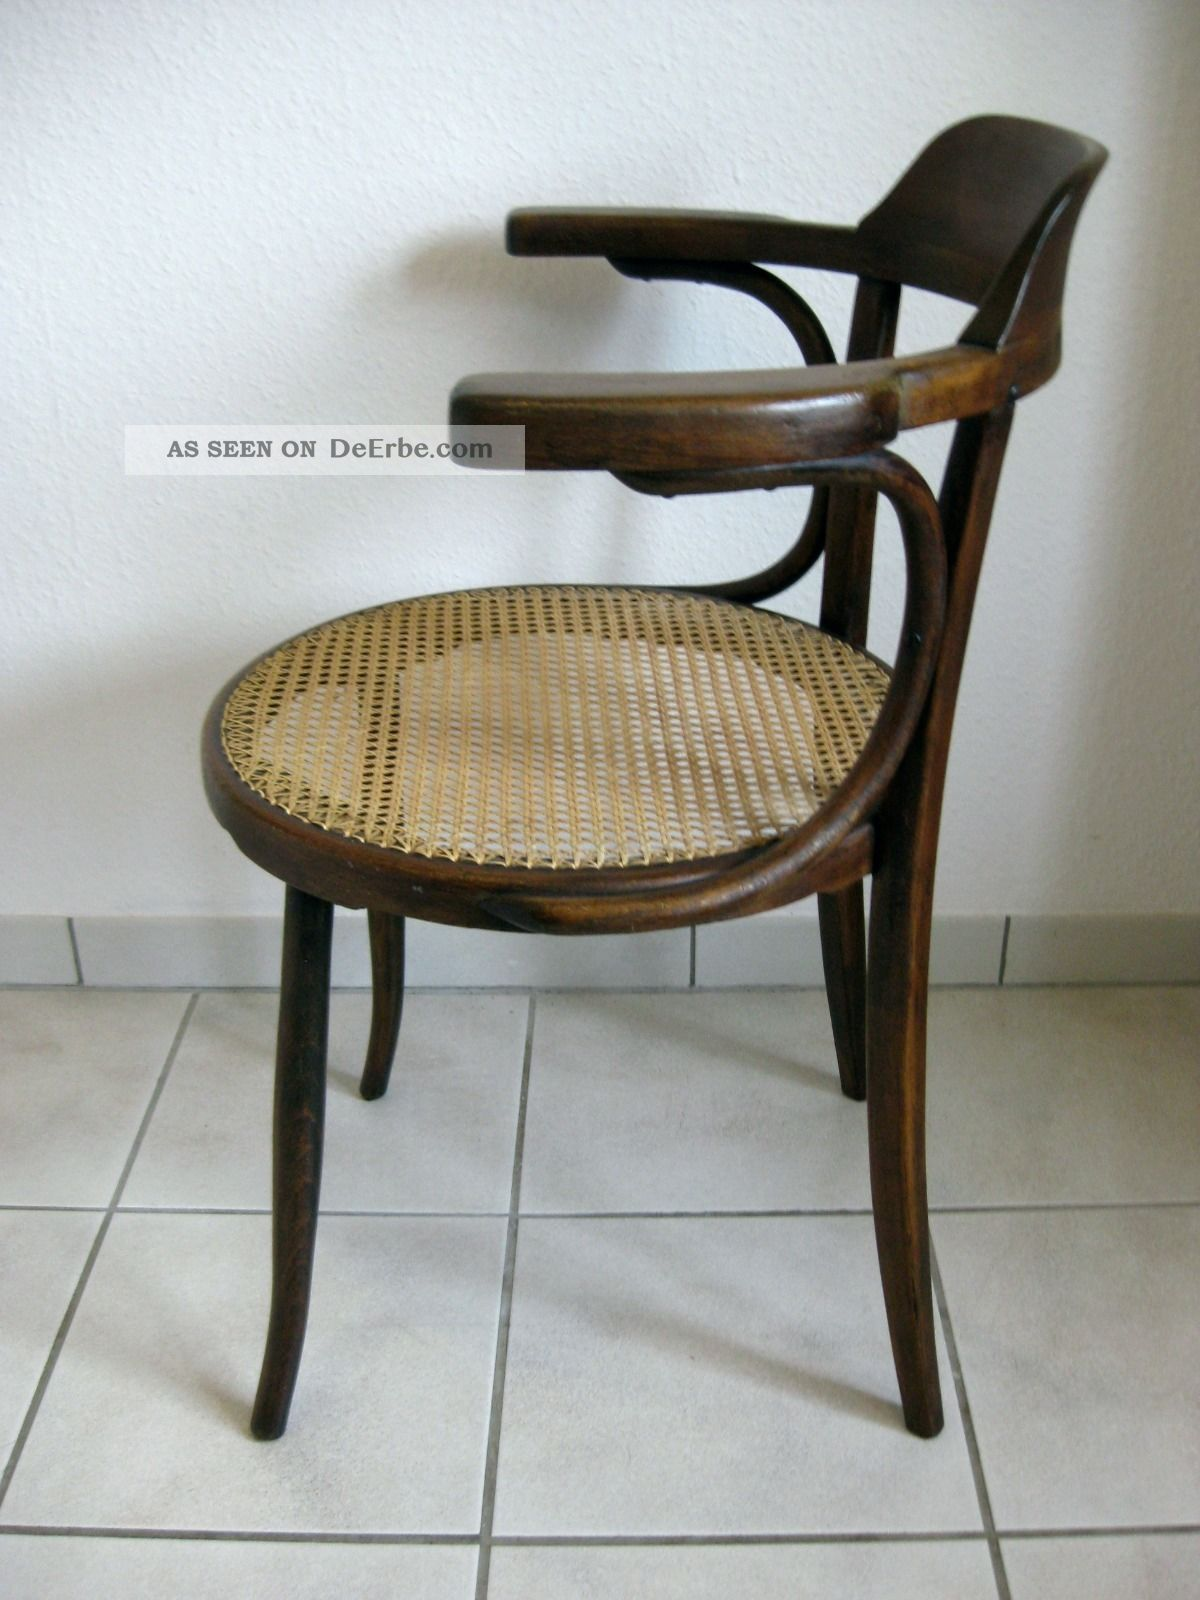 jacob josef kohn bugholz stuhl wiener kaffeehaus stuhl thonet ra. Black Bedroom Furniture Sets. Home Design Ideas